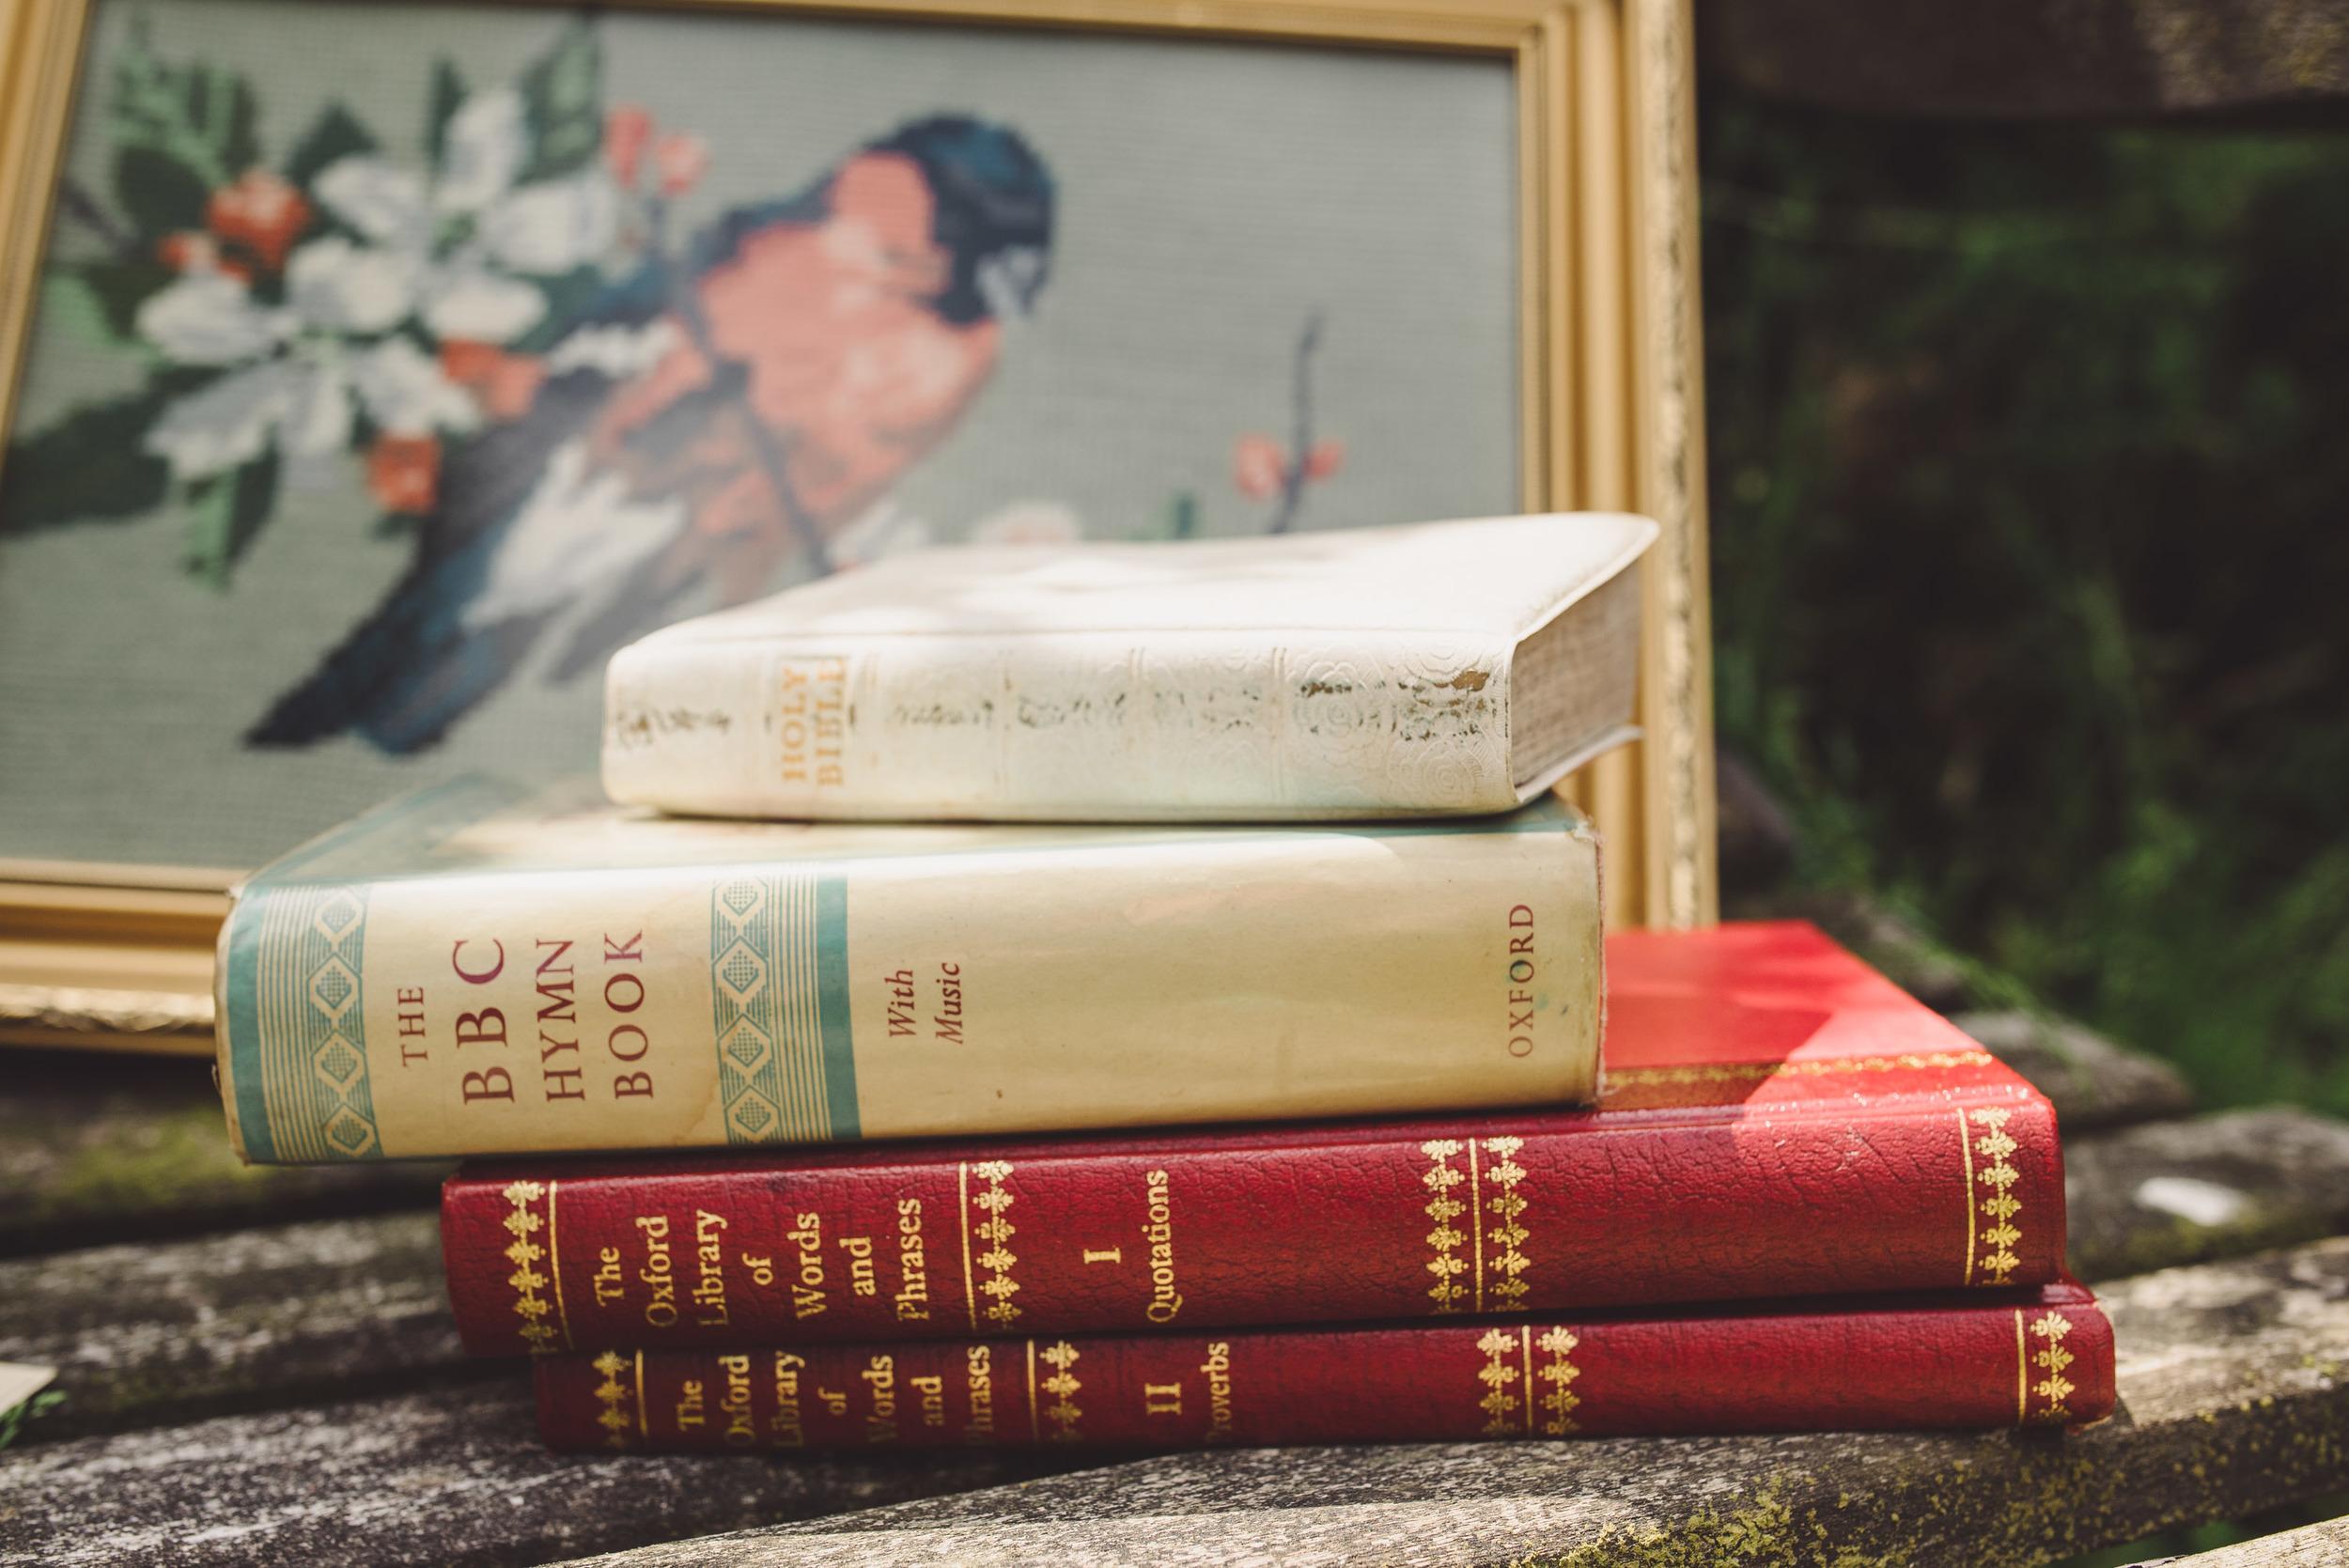 Vintage Books Props provided by: Bespoke Vintage Castle                                Photo Credit: Becky Ryan Photography